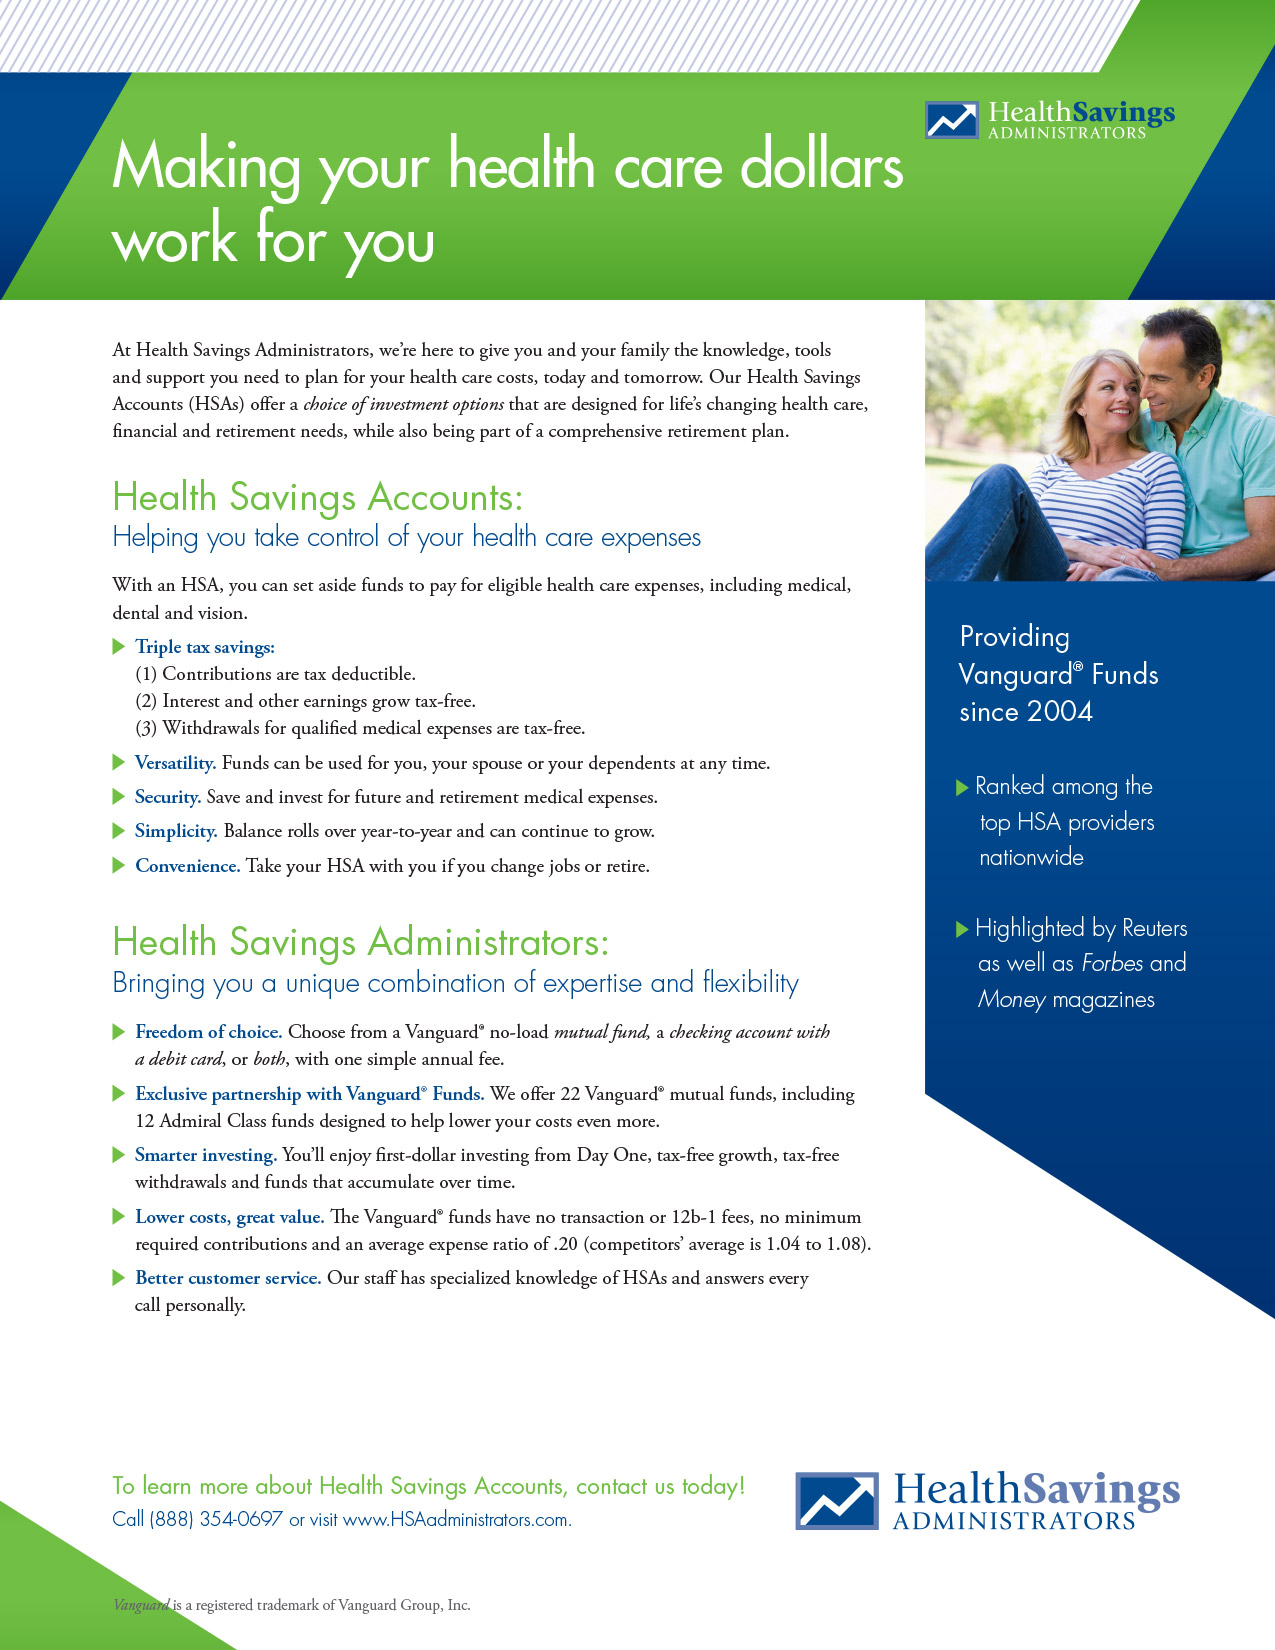 Health Savings Administrators Print Ad 1